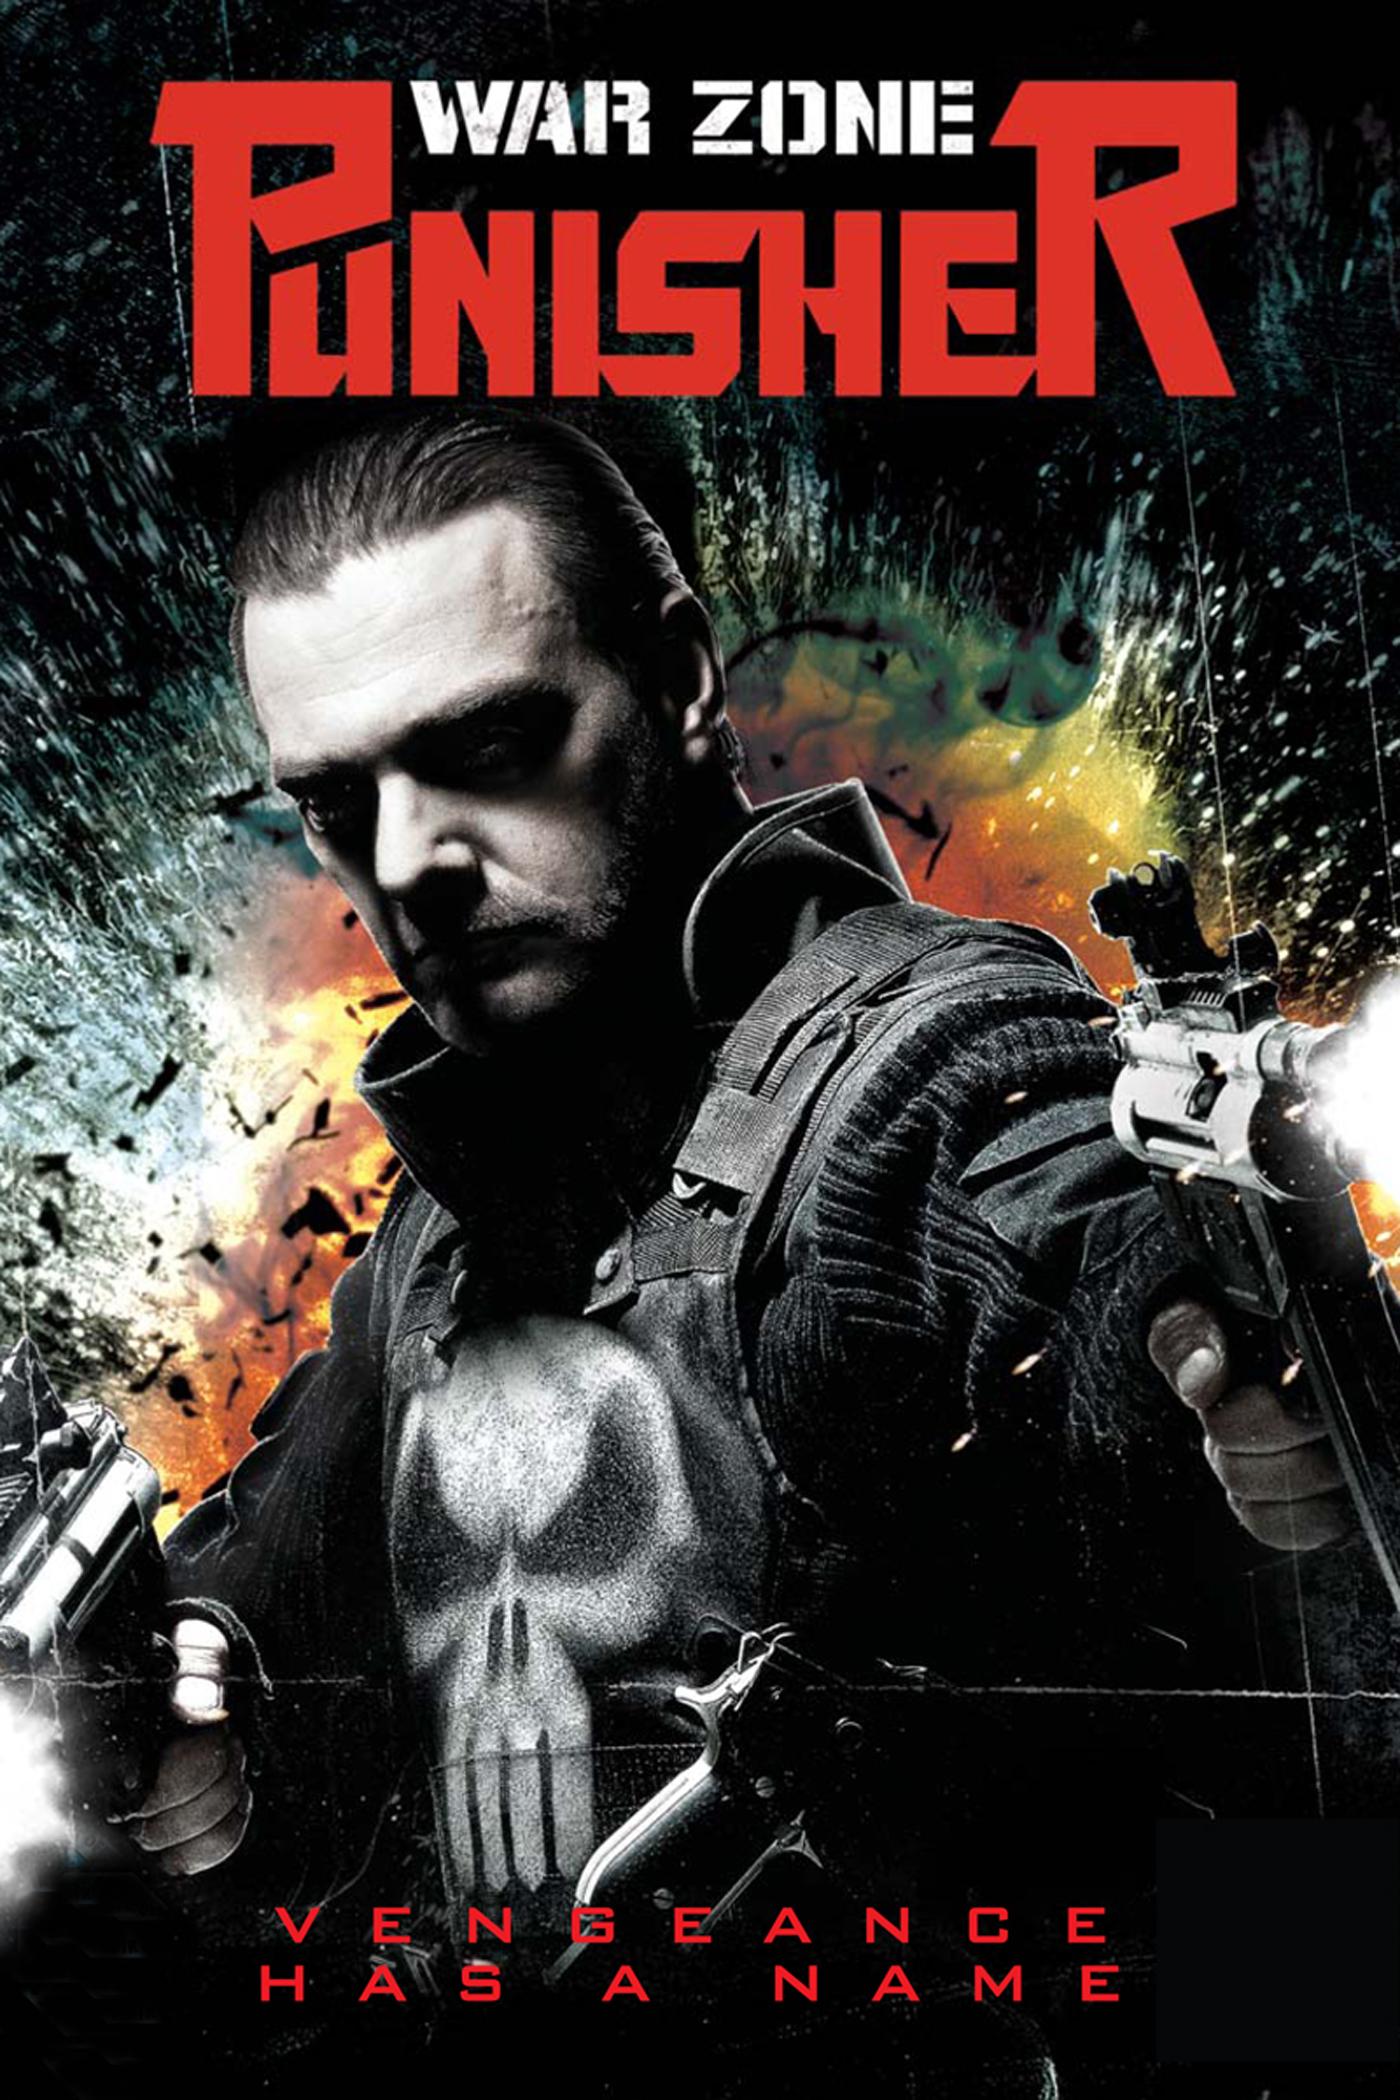 ITunes - Films - The Punisher: War Zone